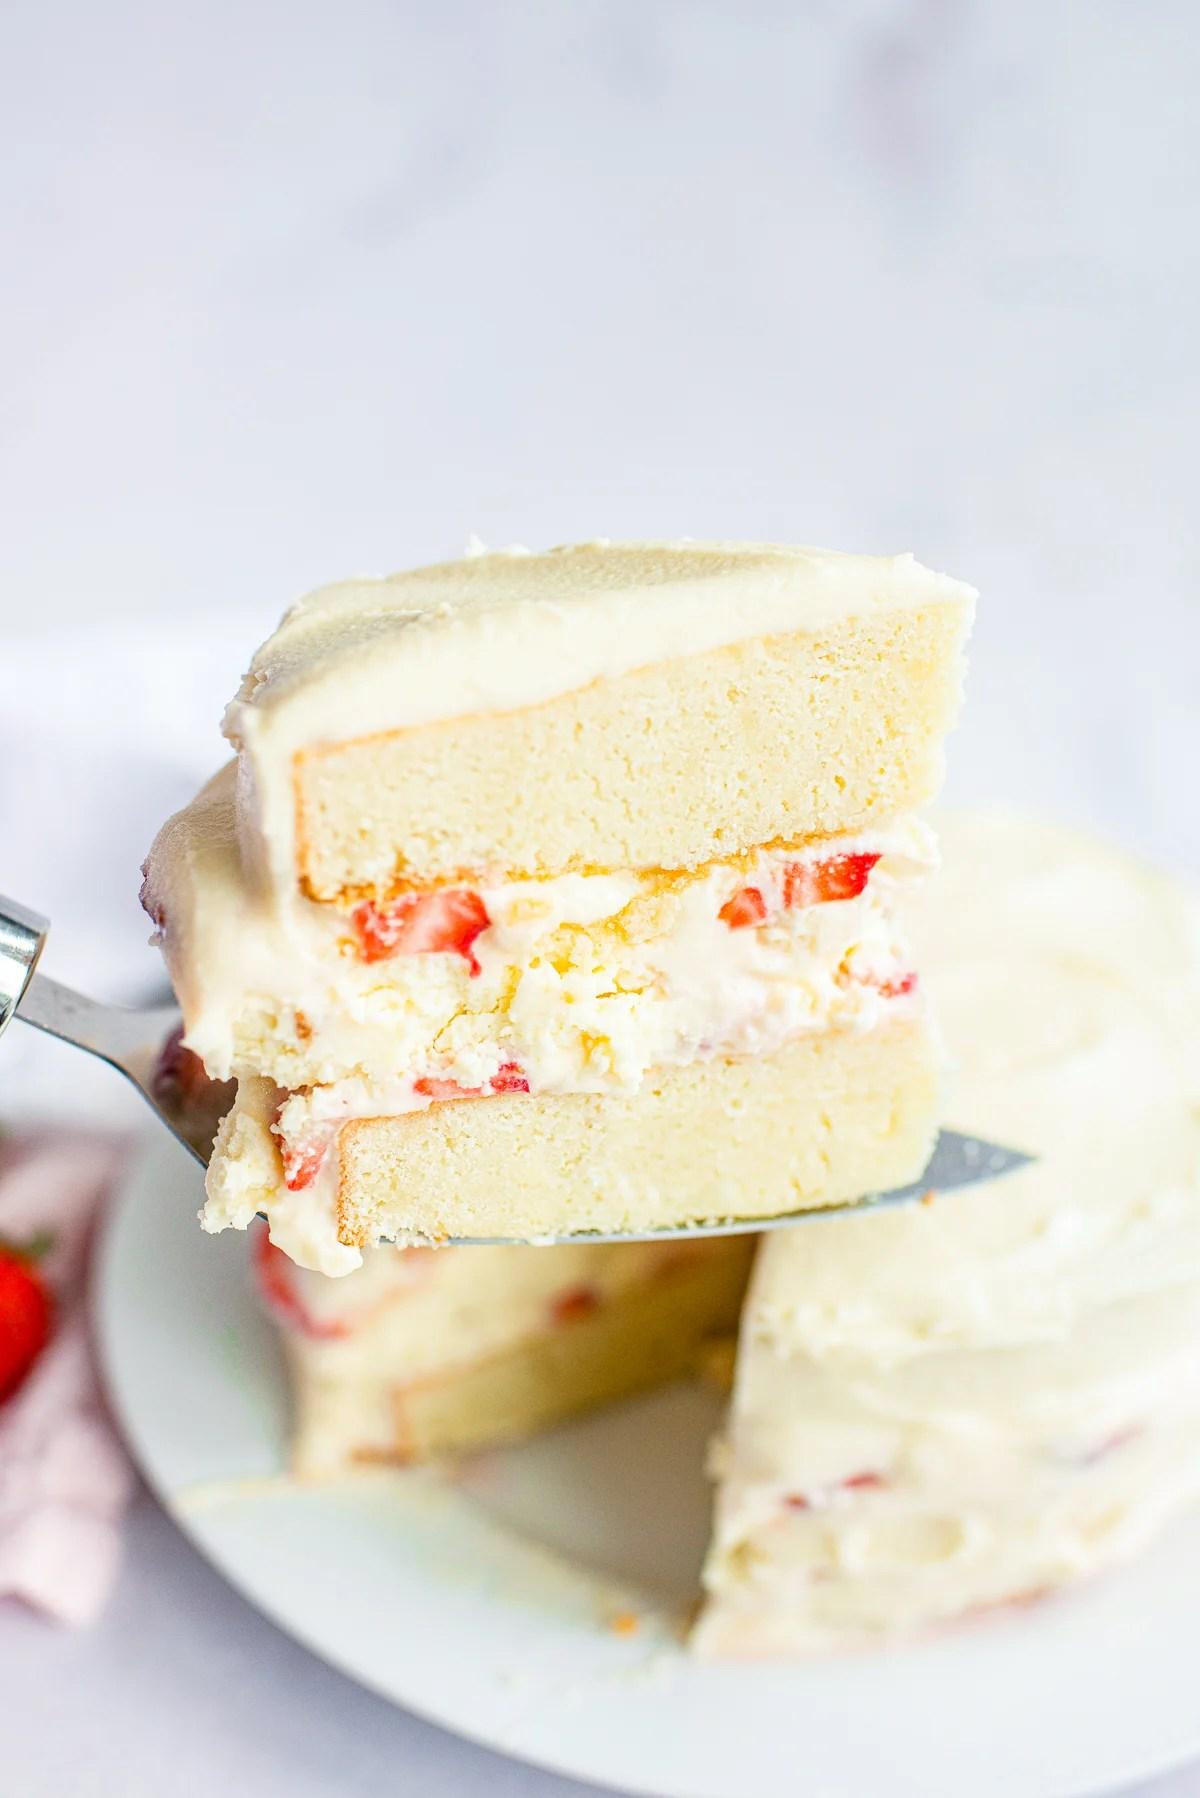 Cake server lifting up a slice of Cheesecake Cake